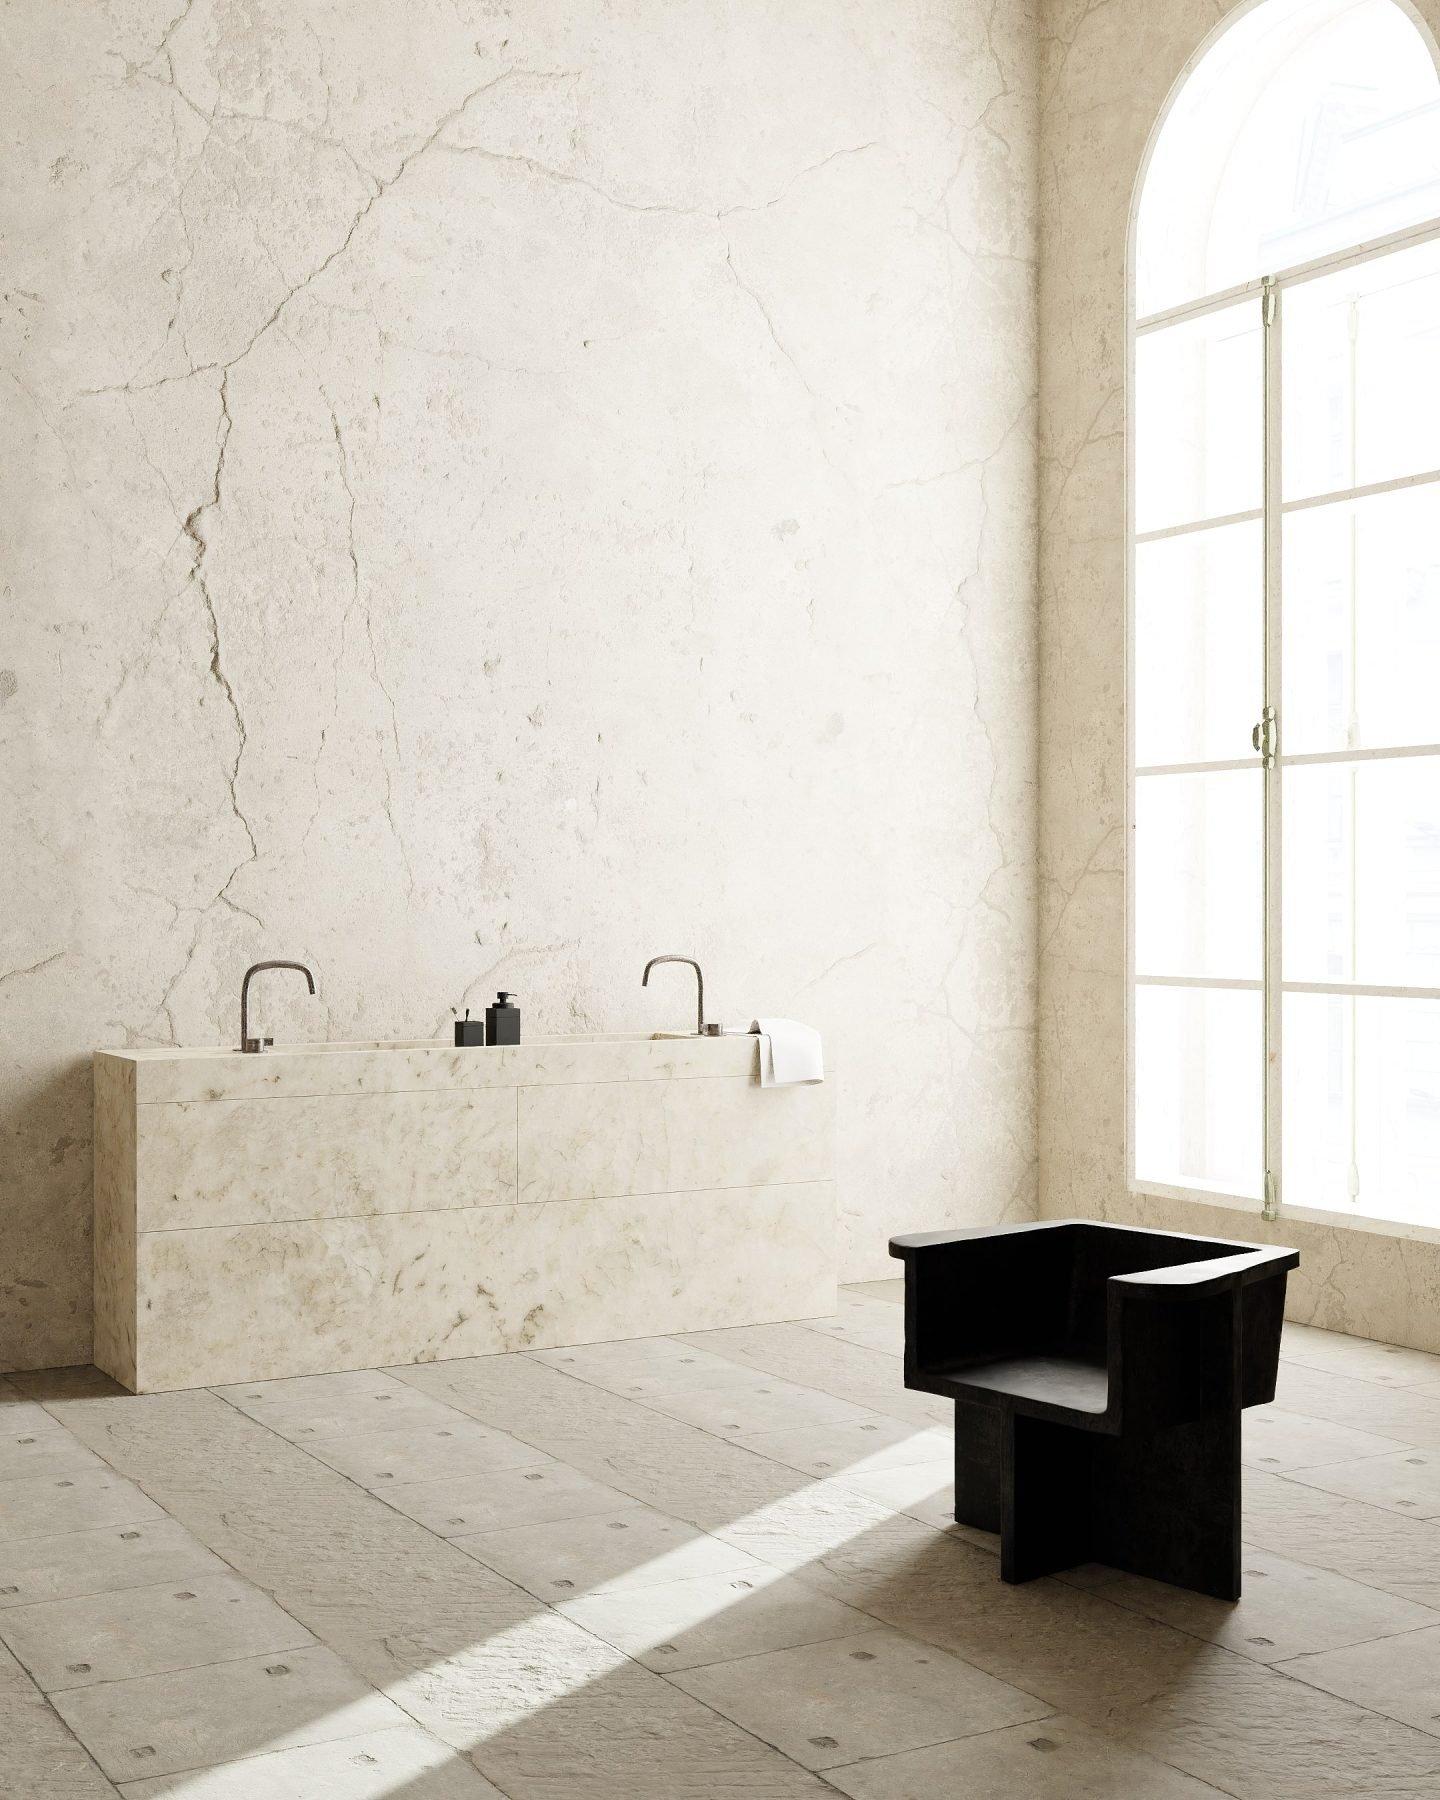 IGNANT-Design-Interview-Osminina-8